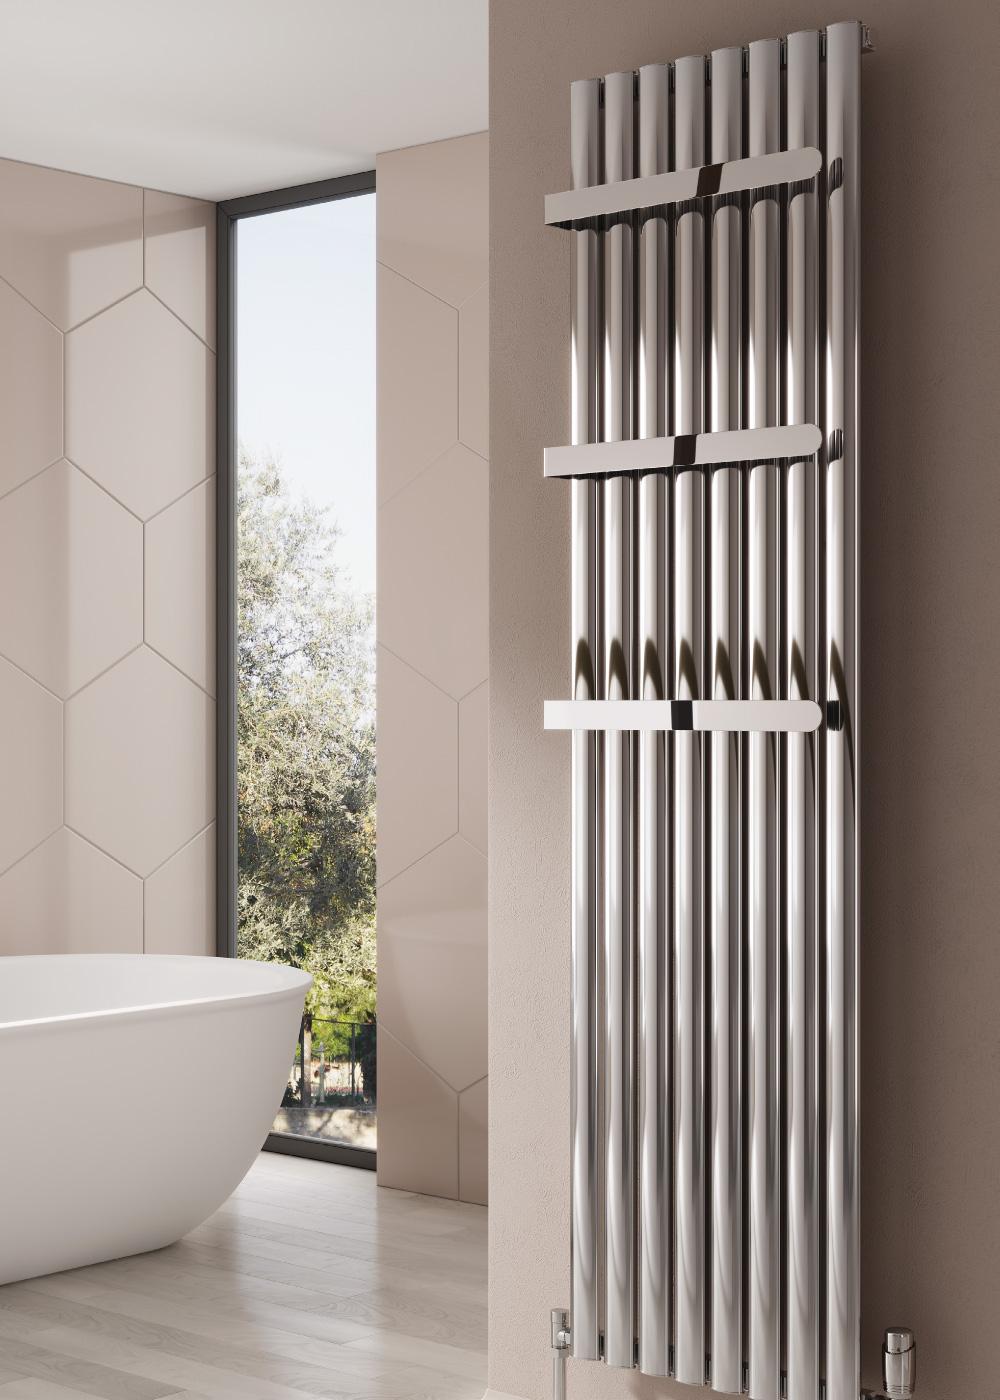 Reina Neval Aluminium Single Vertical Bathroom Towel Rail And Radiator Polished 206 80